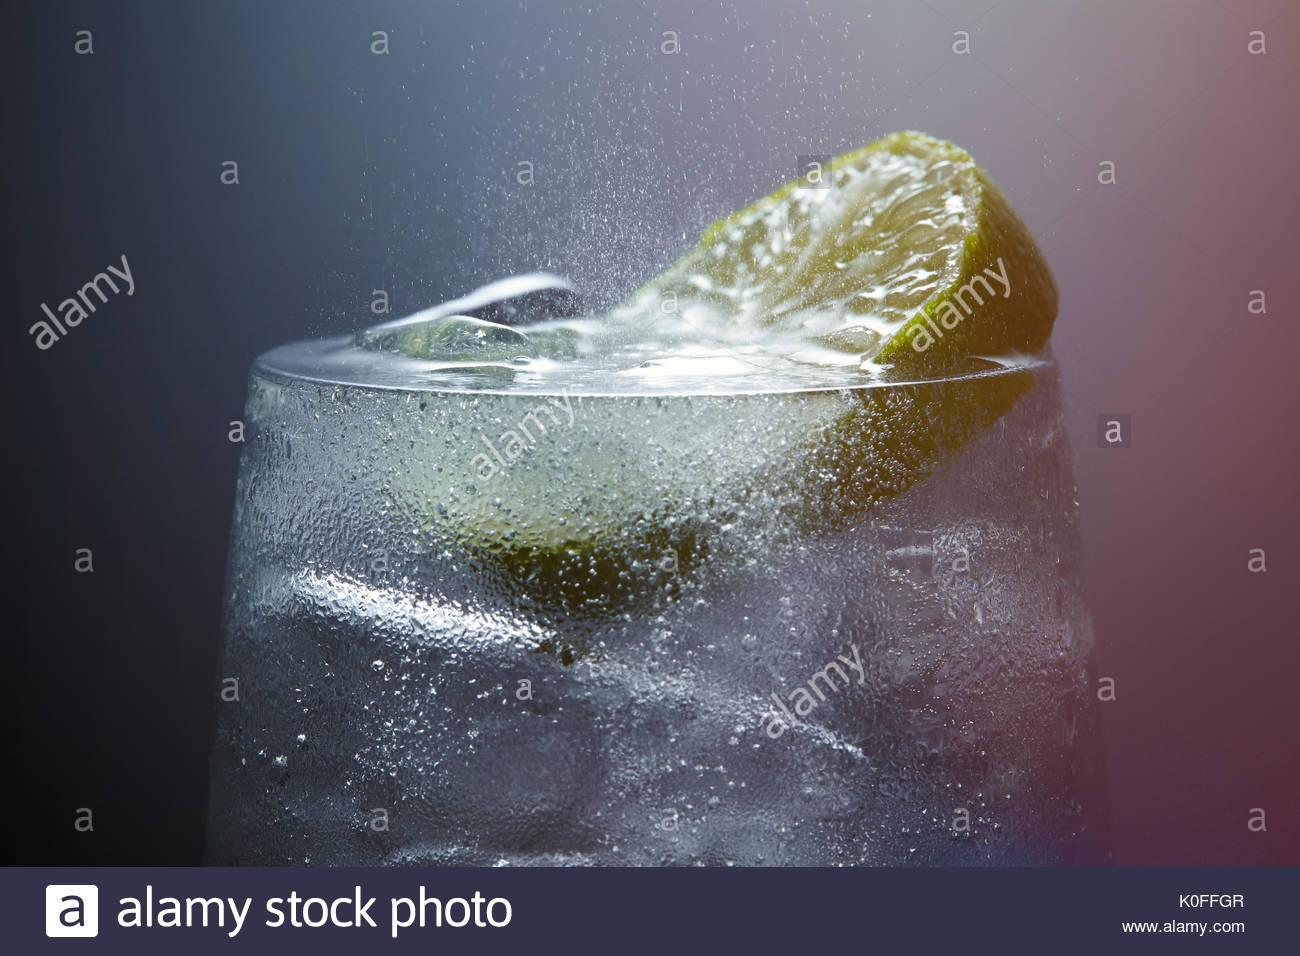 Gin Tonic la bebida gaseosa con limón Imagen De Stock